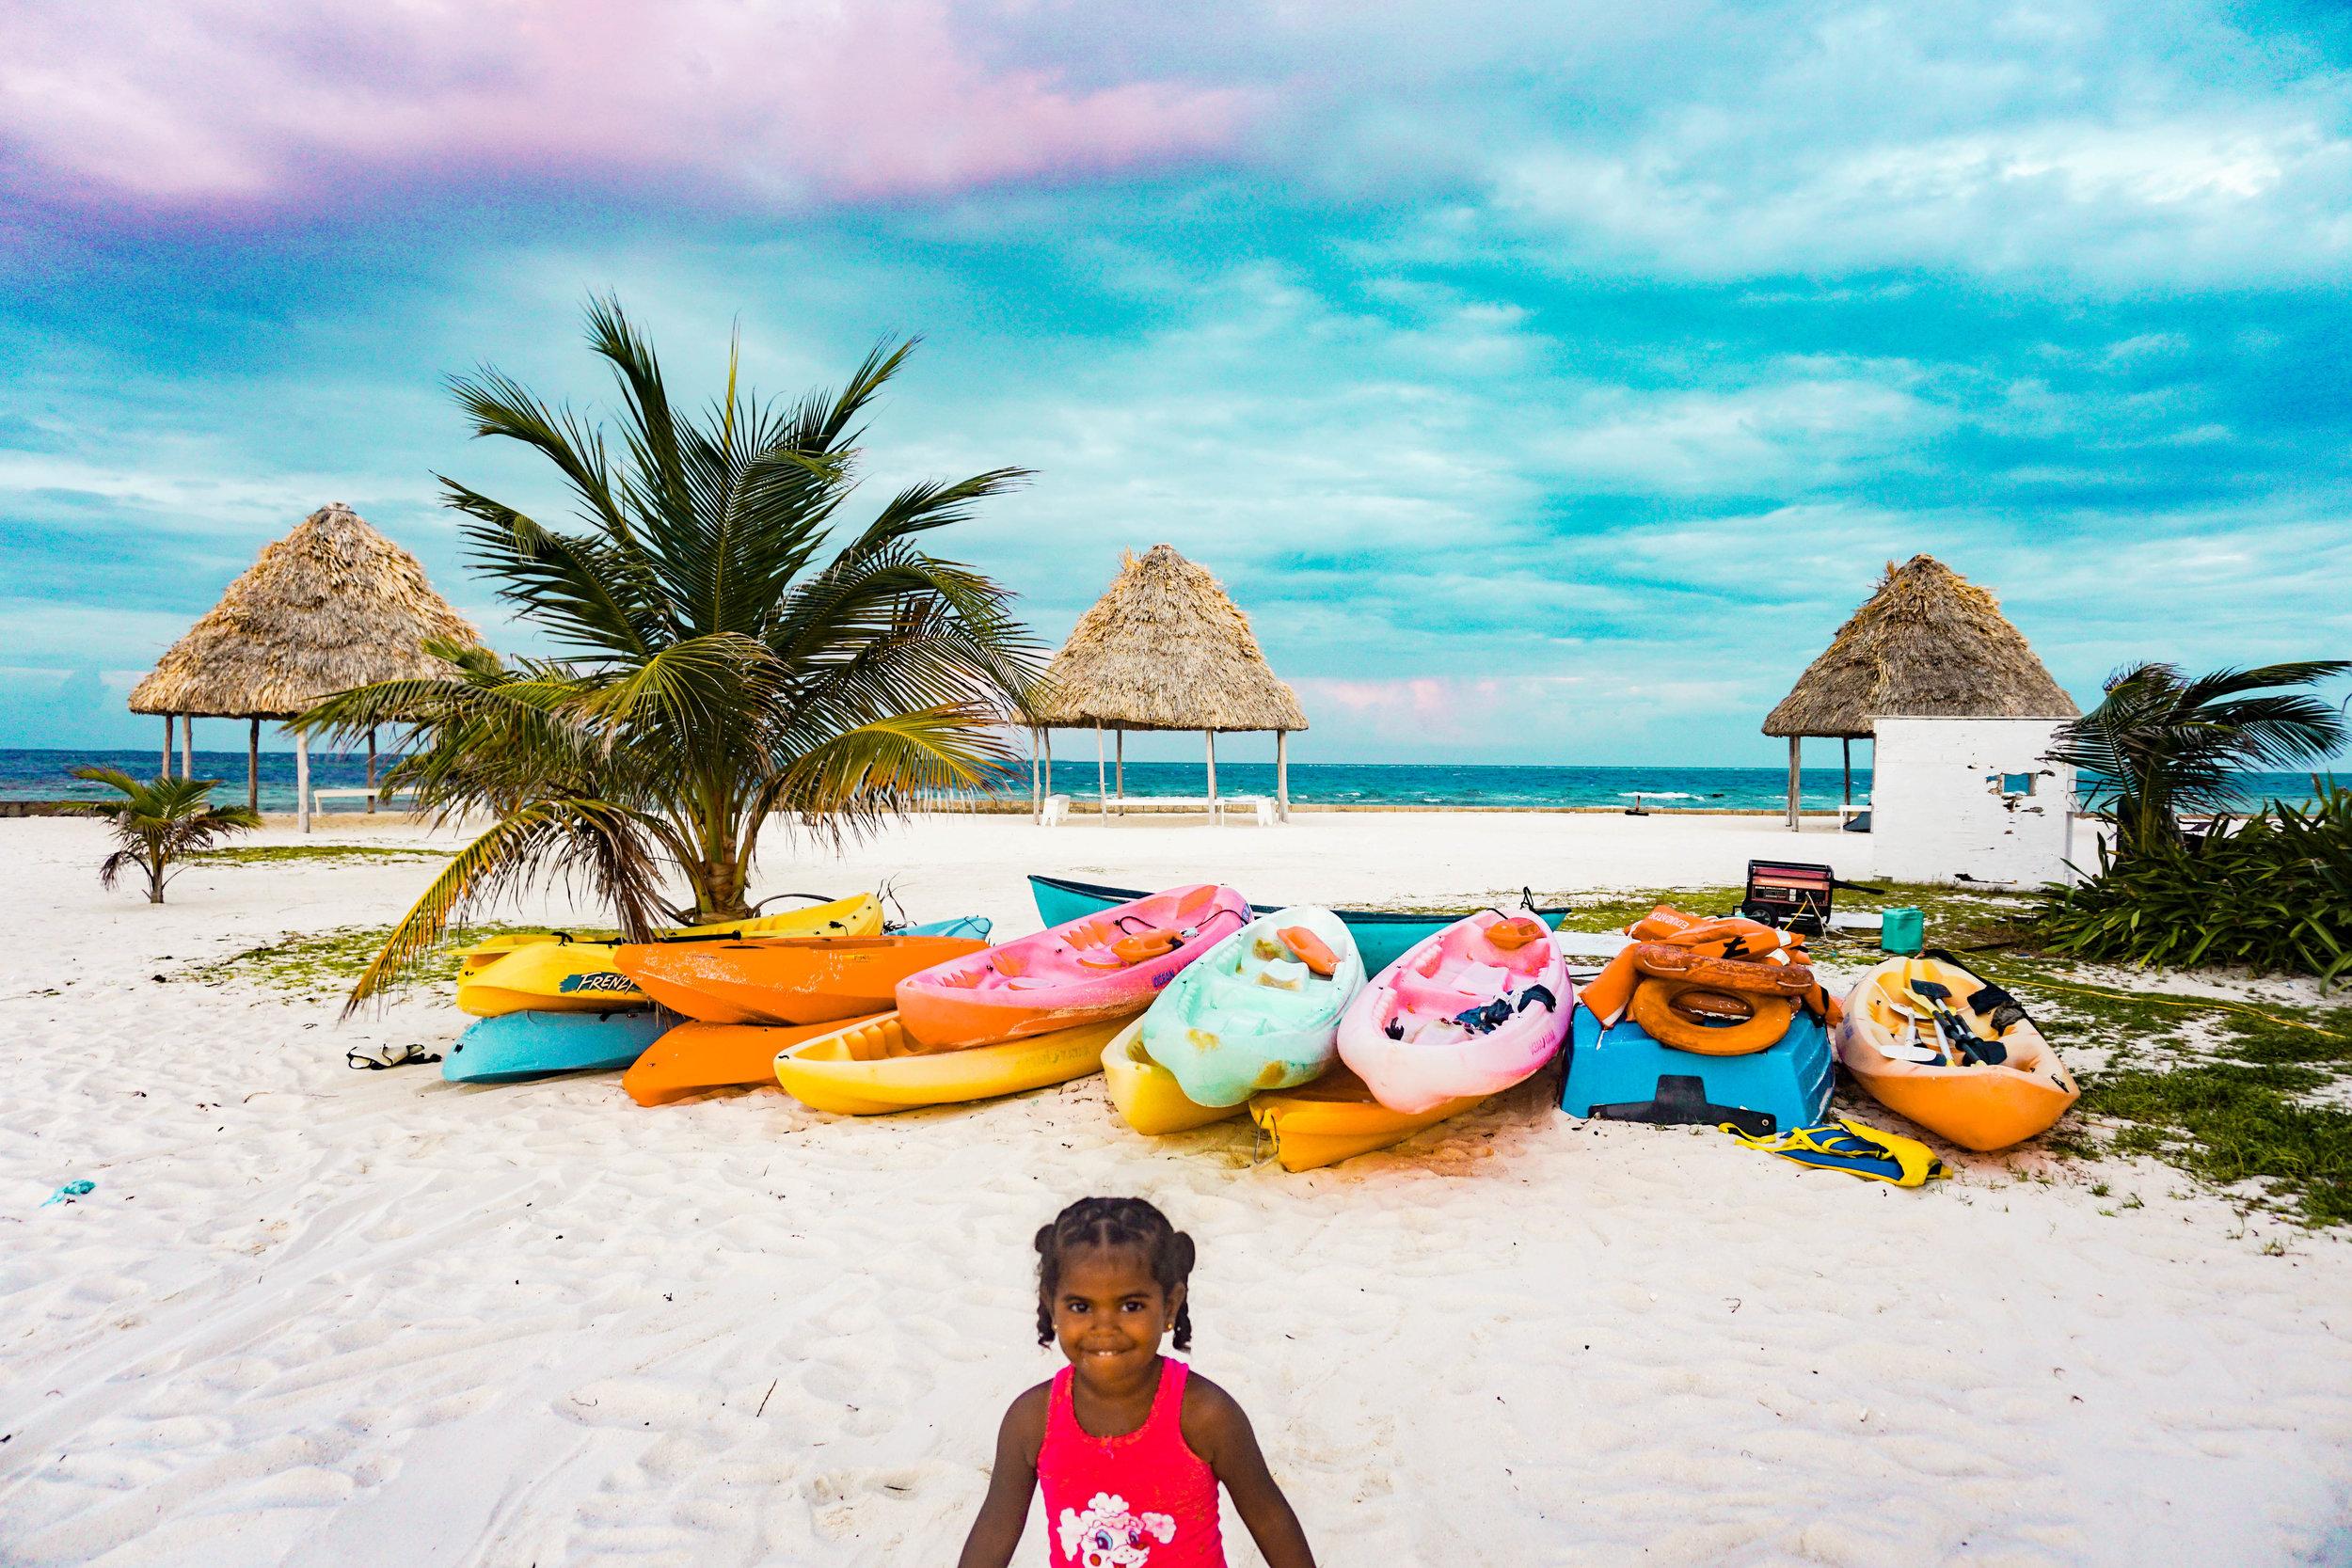 Remote Caye in Belize